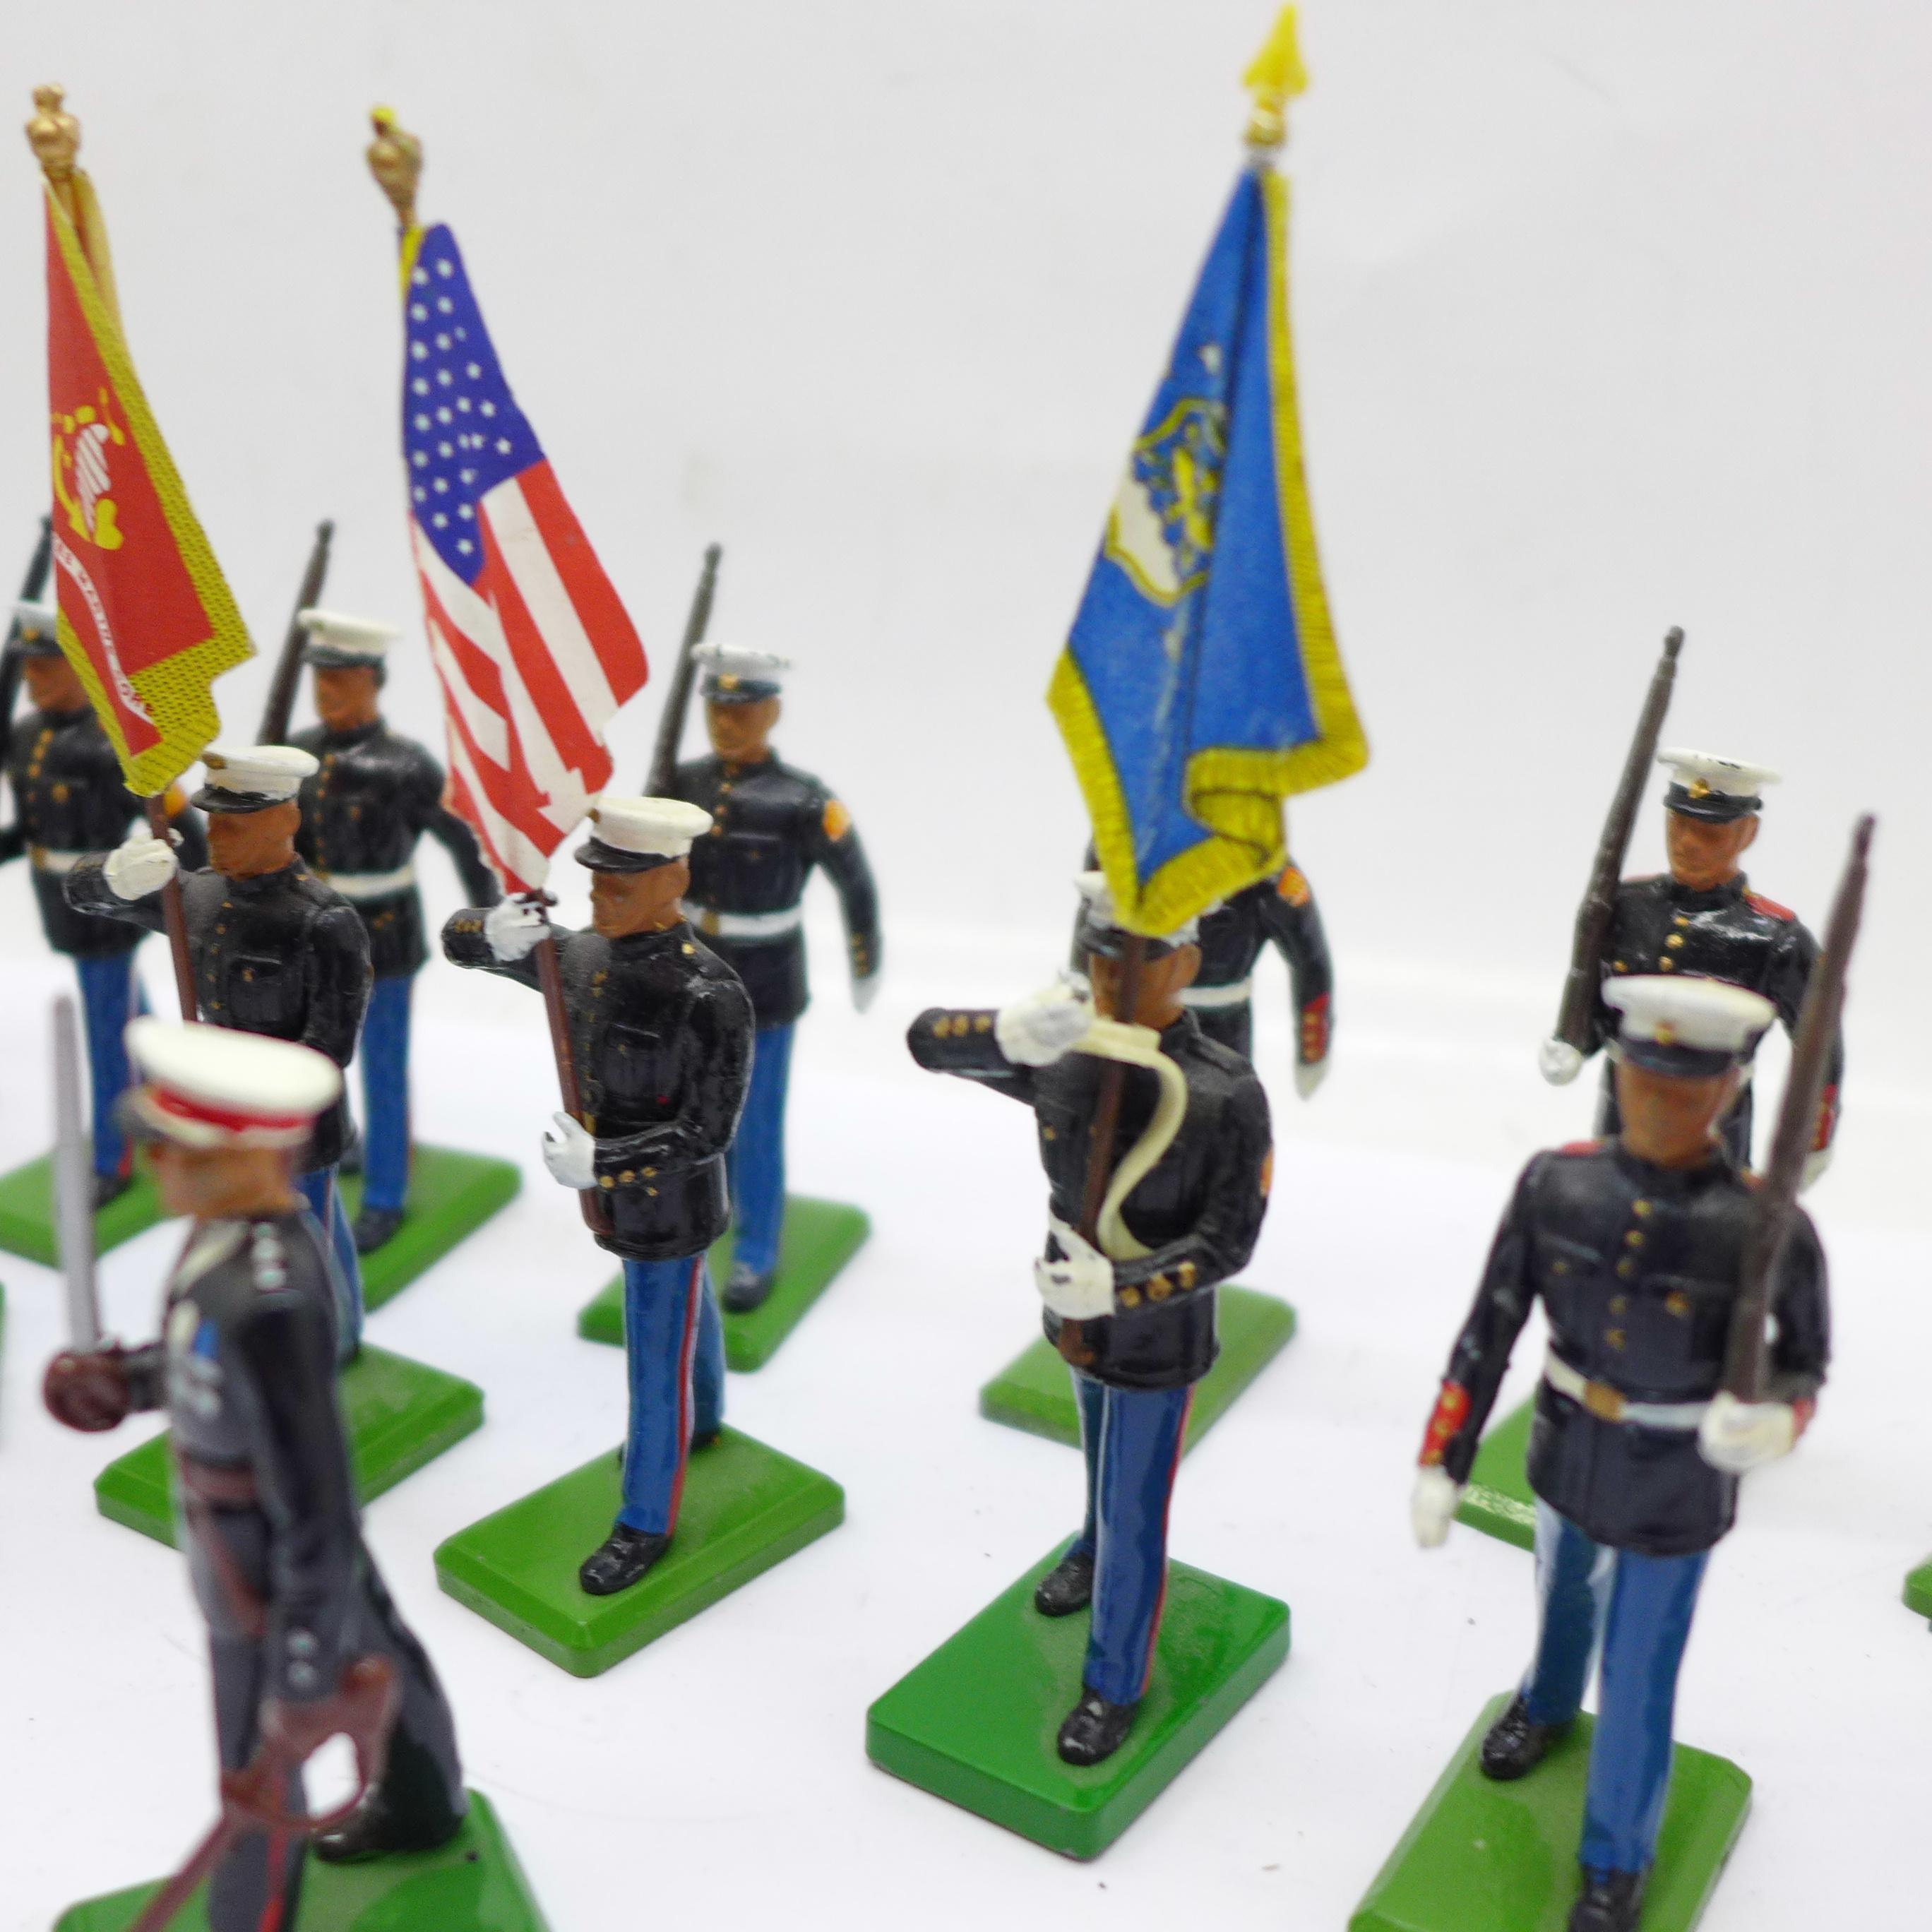 Twenty 1986 Britains Toys marching U.S. Marine figures - Image 4 of 5